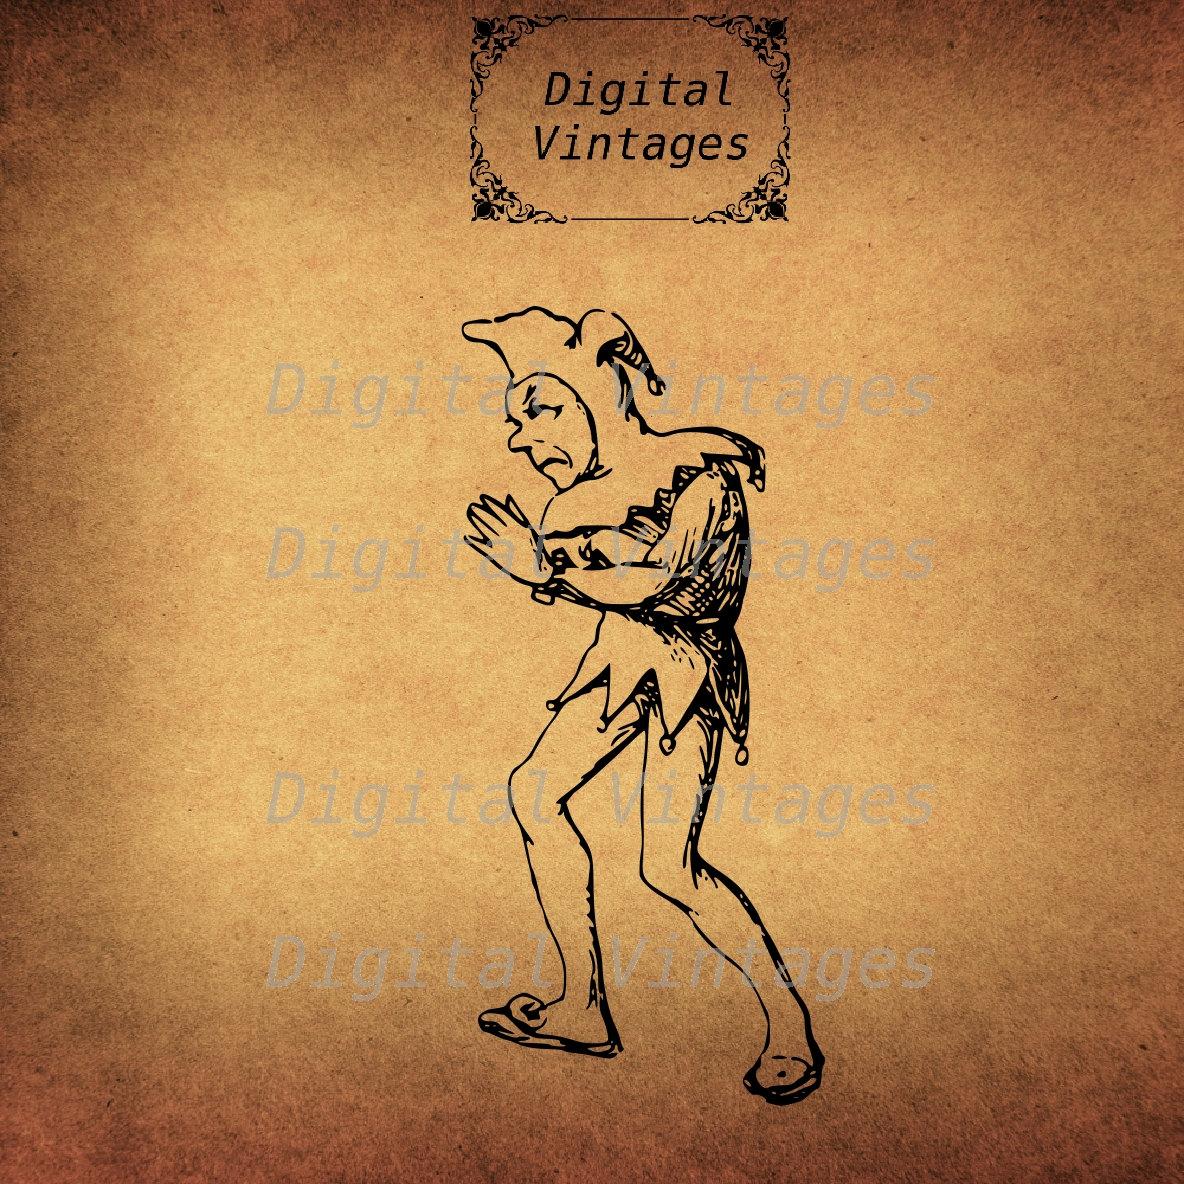 Renaissance clipart jester Cartoon Comic illustration Renaissance digital